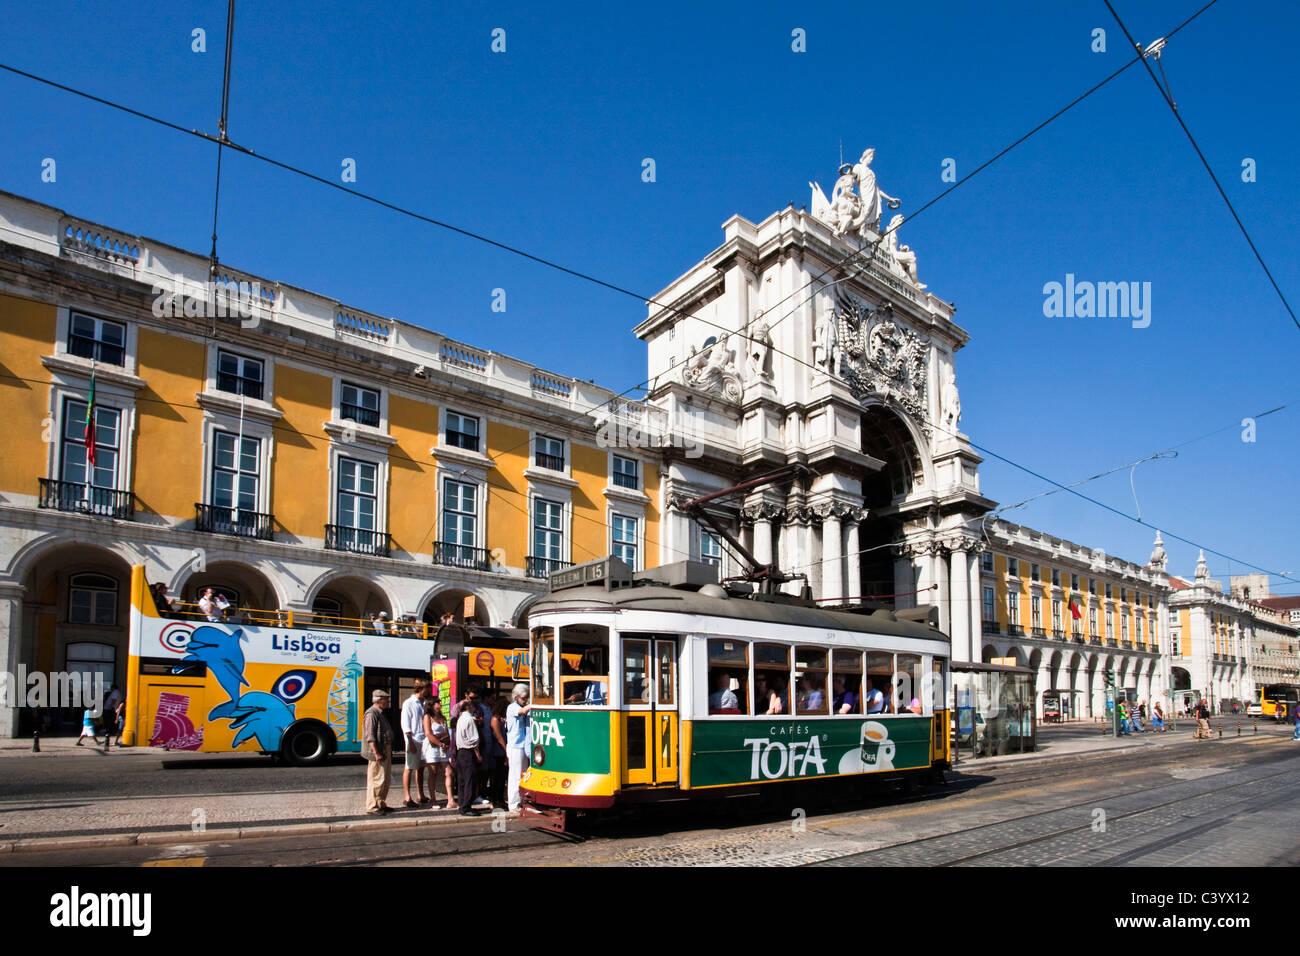 Portugal, Europe, Lisbon, Comerico, archway, tram, streetcar, streetcar, tourism, - Stock Image